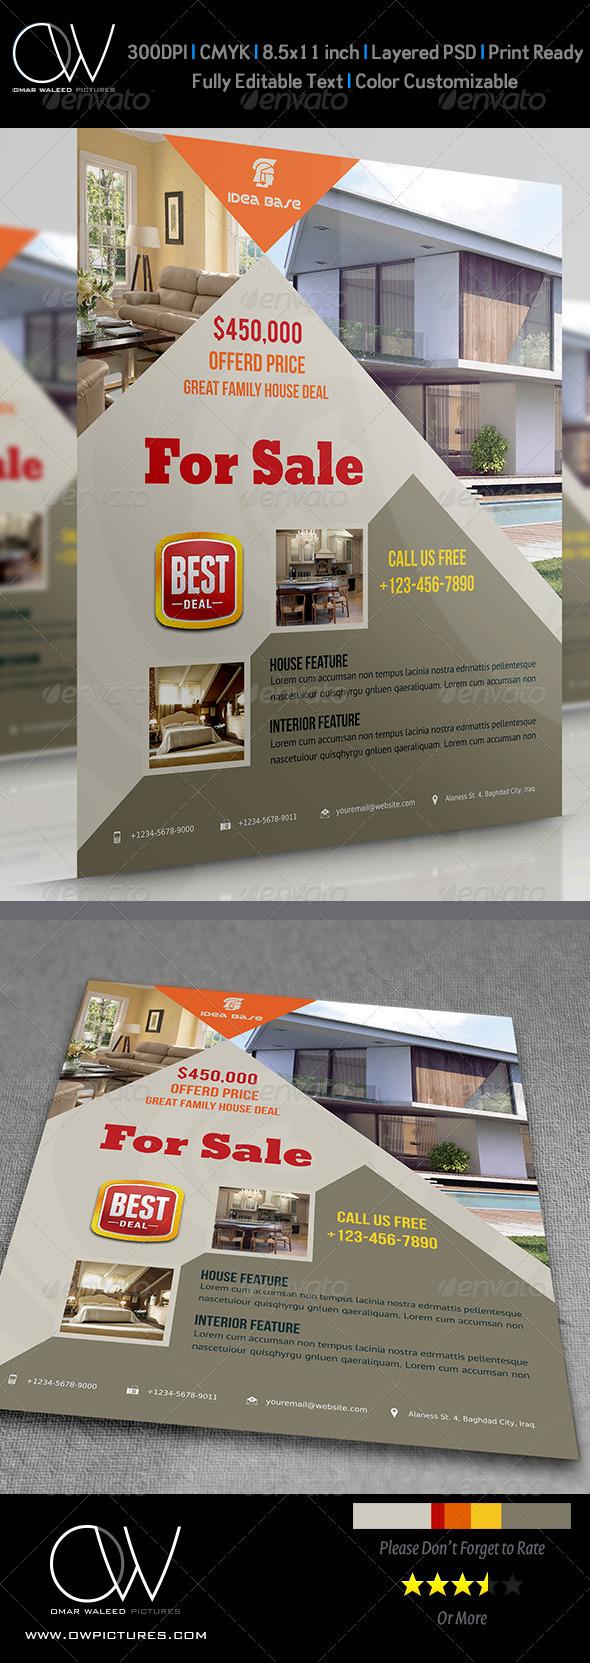 Real Estate Flyer Vol.4 - Flyers Print Templates